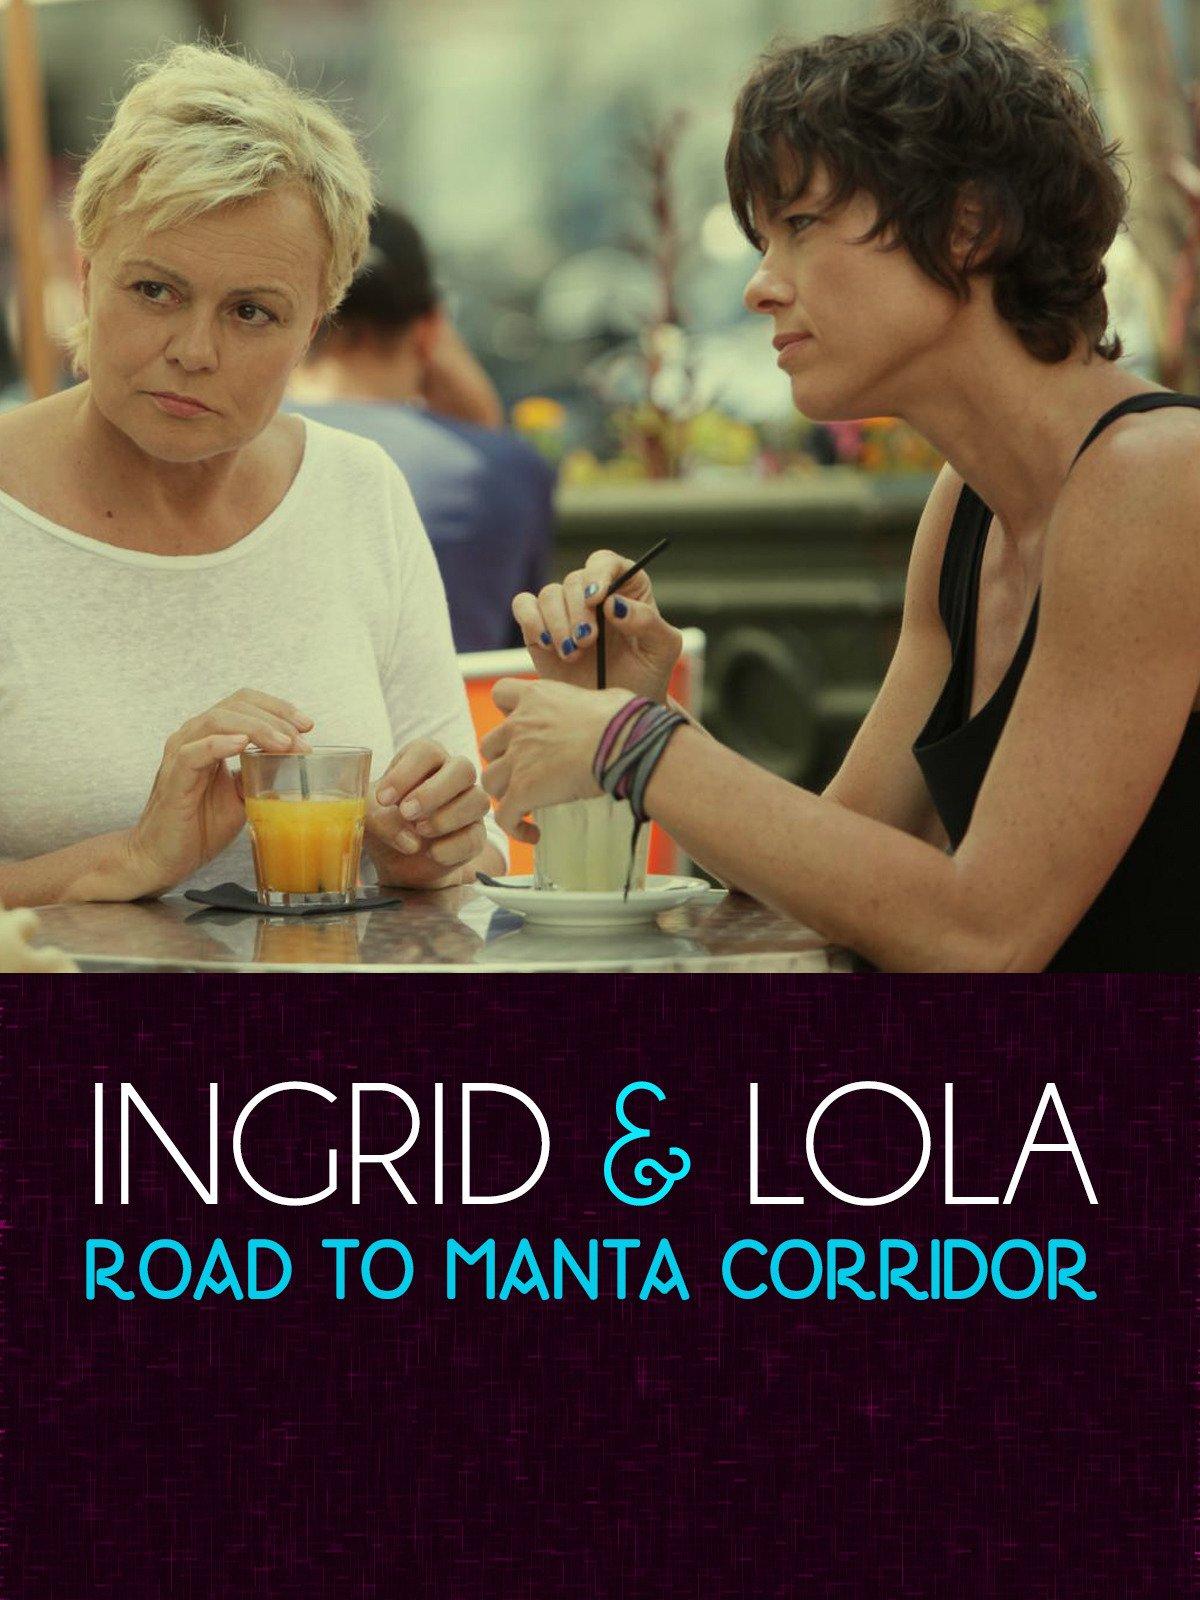 Amazon.com: Ingrid & Lola - Road to Manta Corridor: Muriel Robin, Anne Le Nen, Pascal Ternisien, Jérôme Foulon: Amazon Digital Services LLC